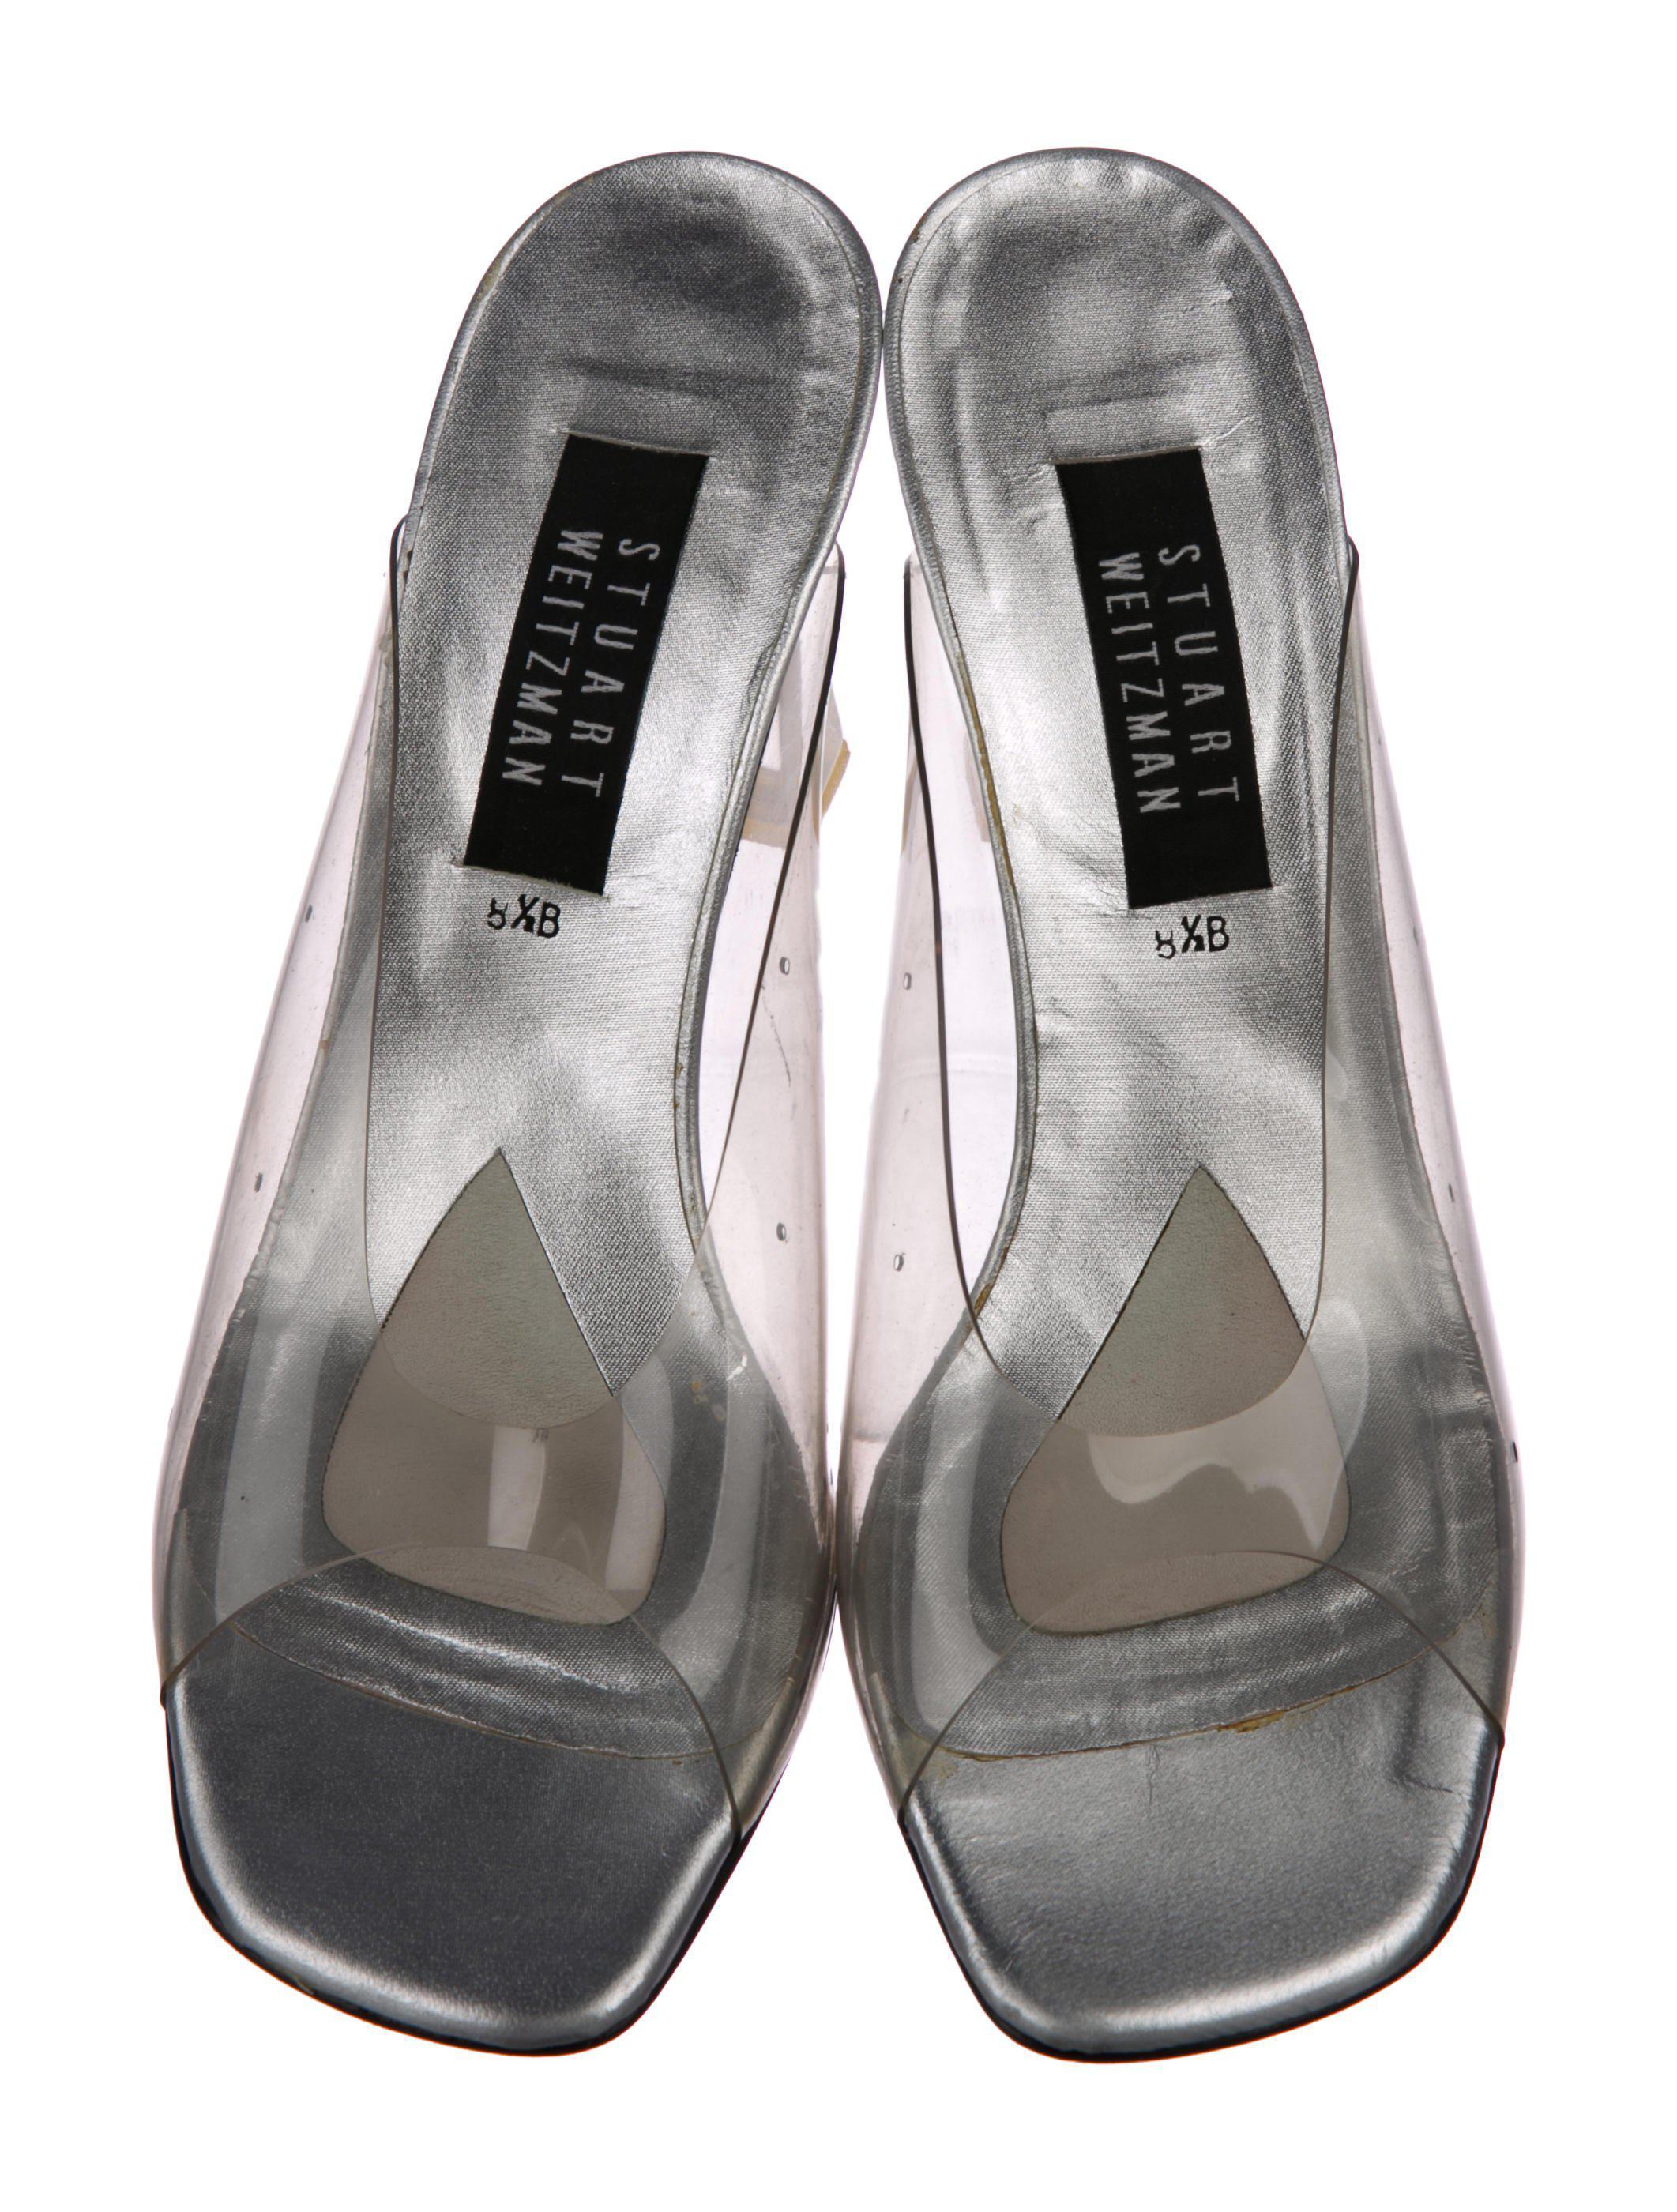 9f60f4a93e274e ... Metallic Pvc Slide Sandals Clear - Lyst. View fullscreen